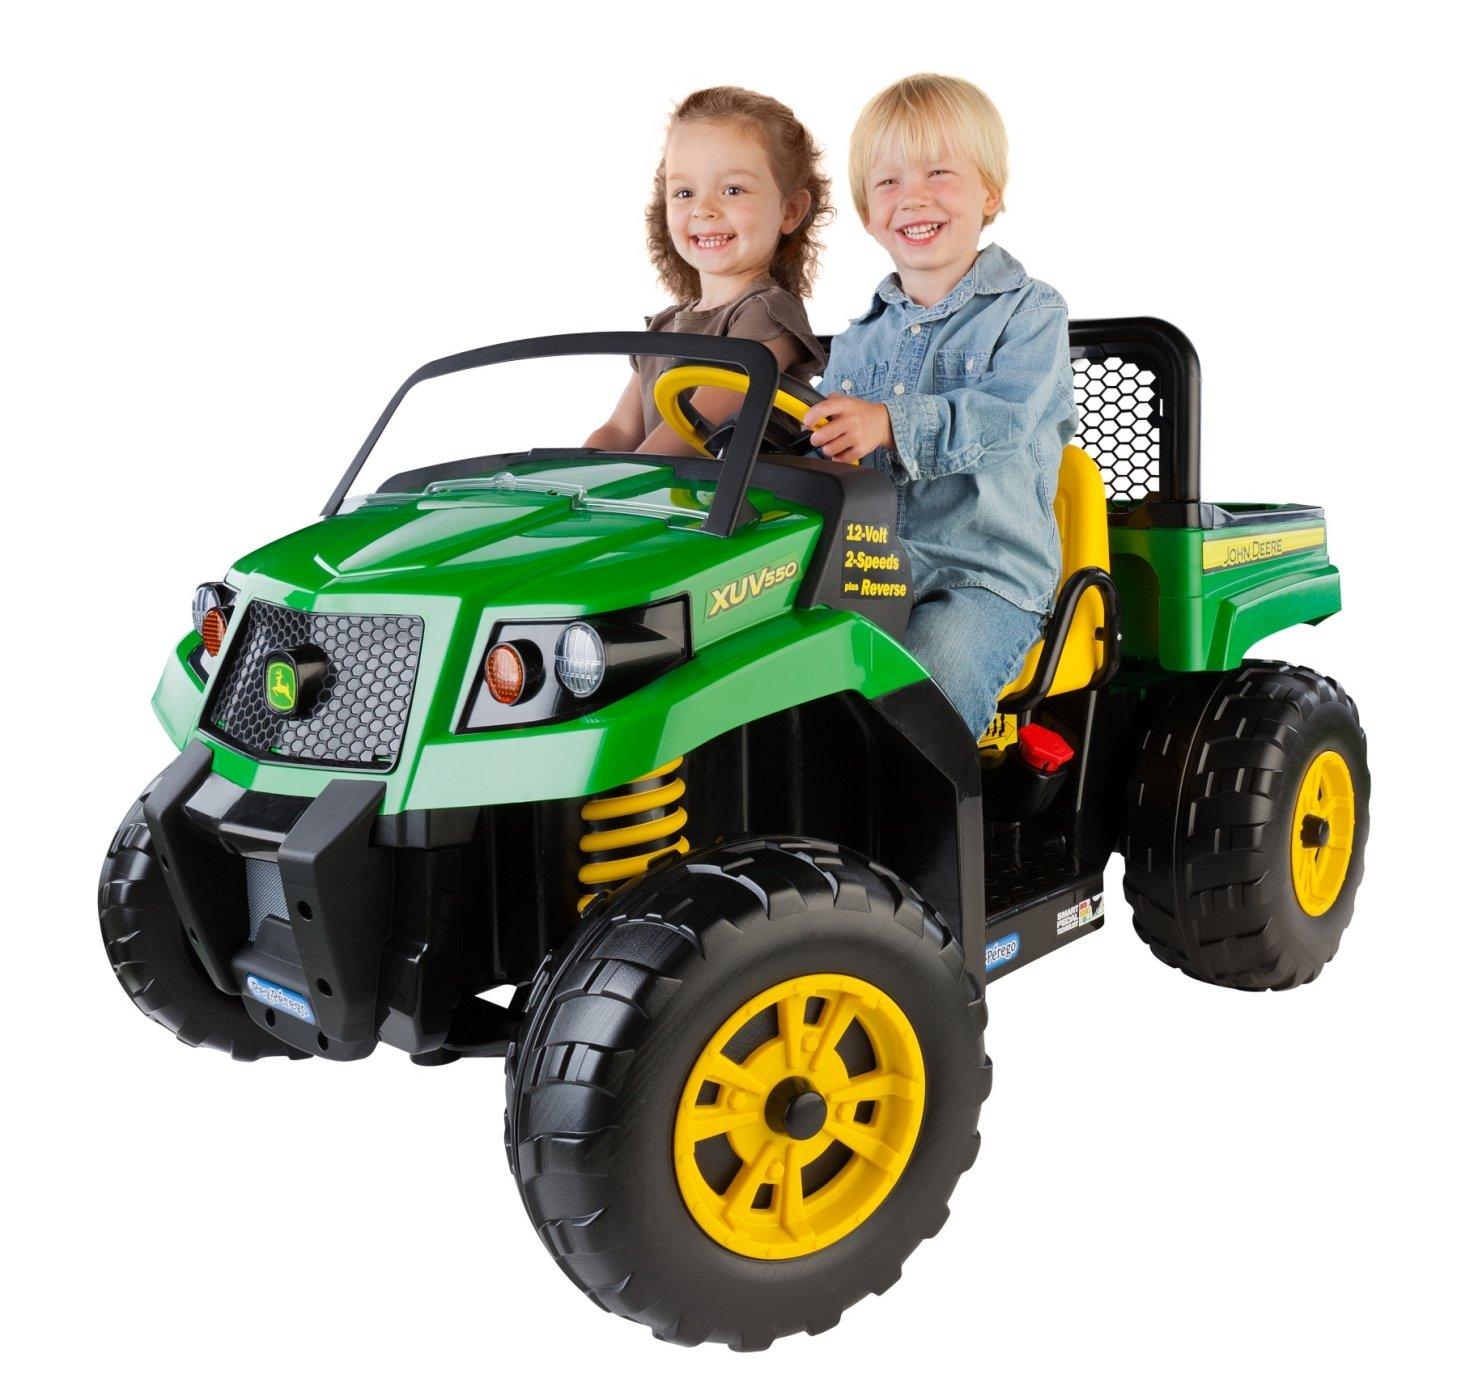 Riding Toys For Boys : Kids riding car vehicle john deere gator truck dump bed